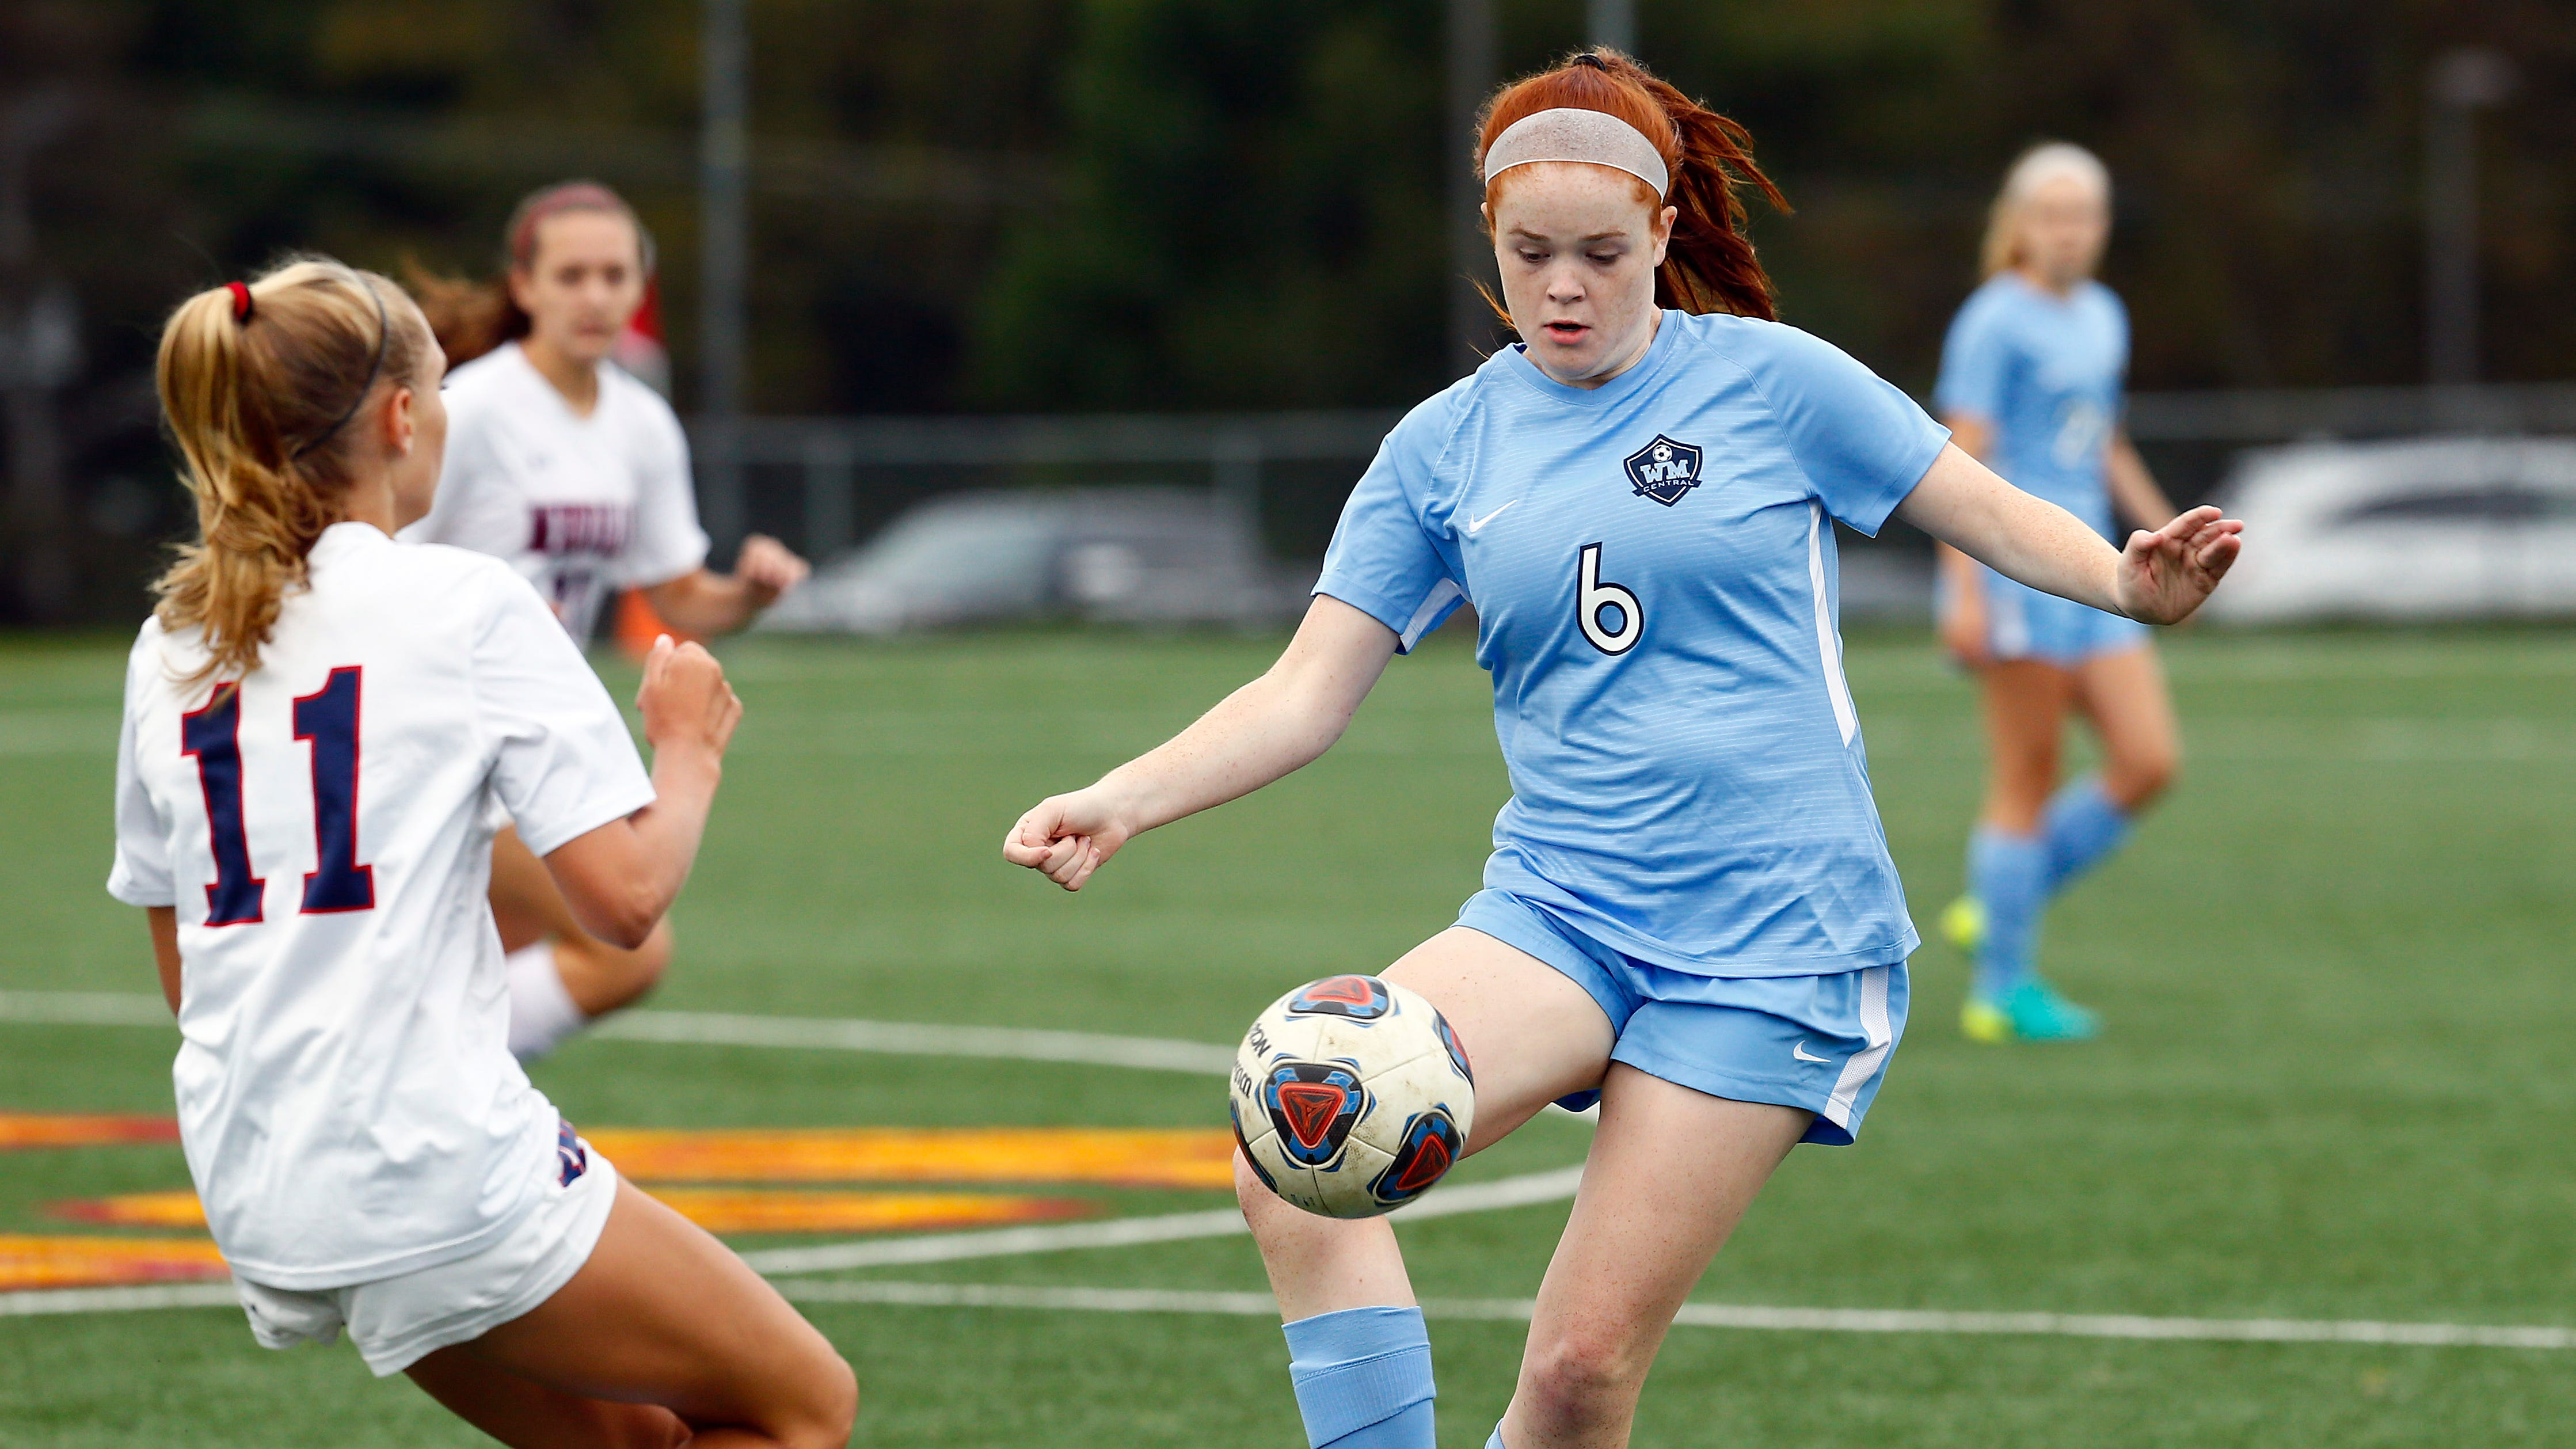 West Morris' Bridget Moylan controls the ball vs. Mendham during their NJAC-American girls soccer match. September 19, 2018, Mt Olive, NJ